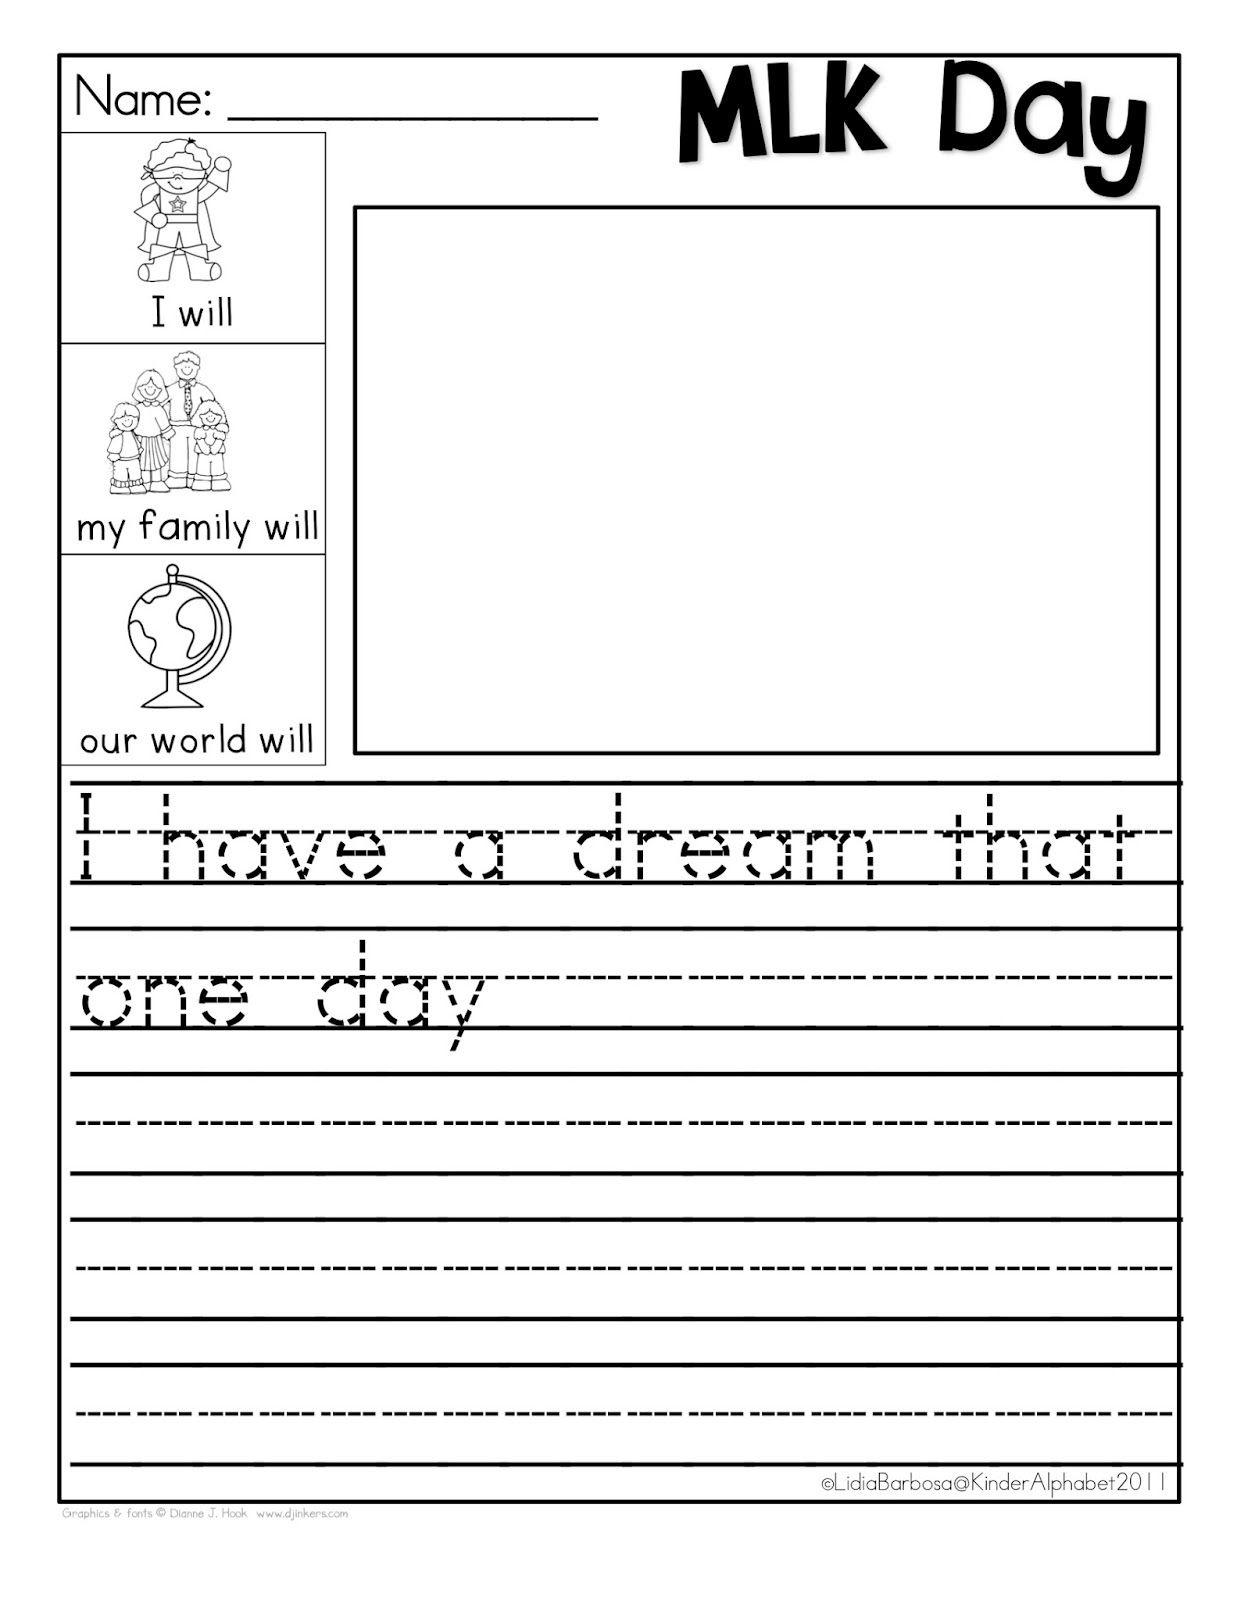 Martin Luther King Jr. Freebie { I Have A Dream } | Classroom - Free Printable Martin Luther King Jr Worksheets For Kindergarten